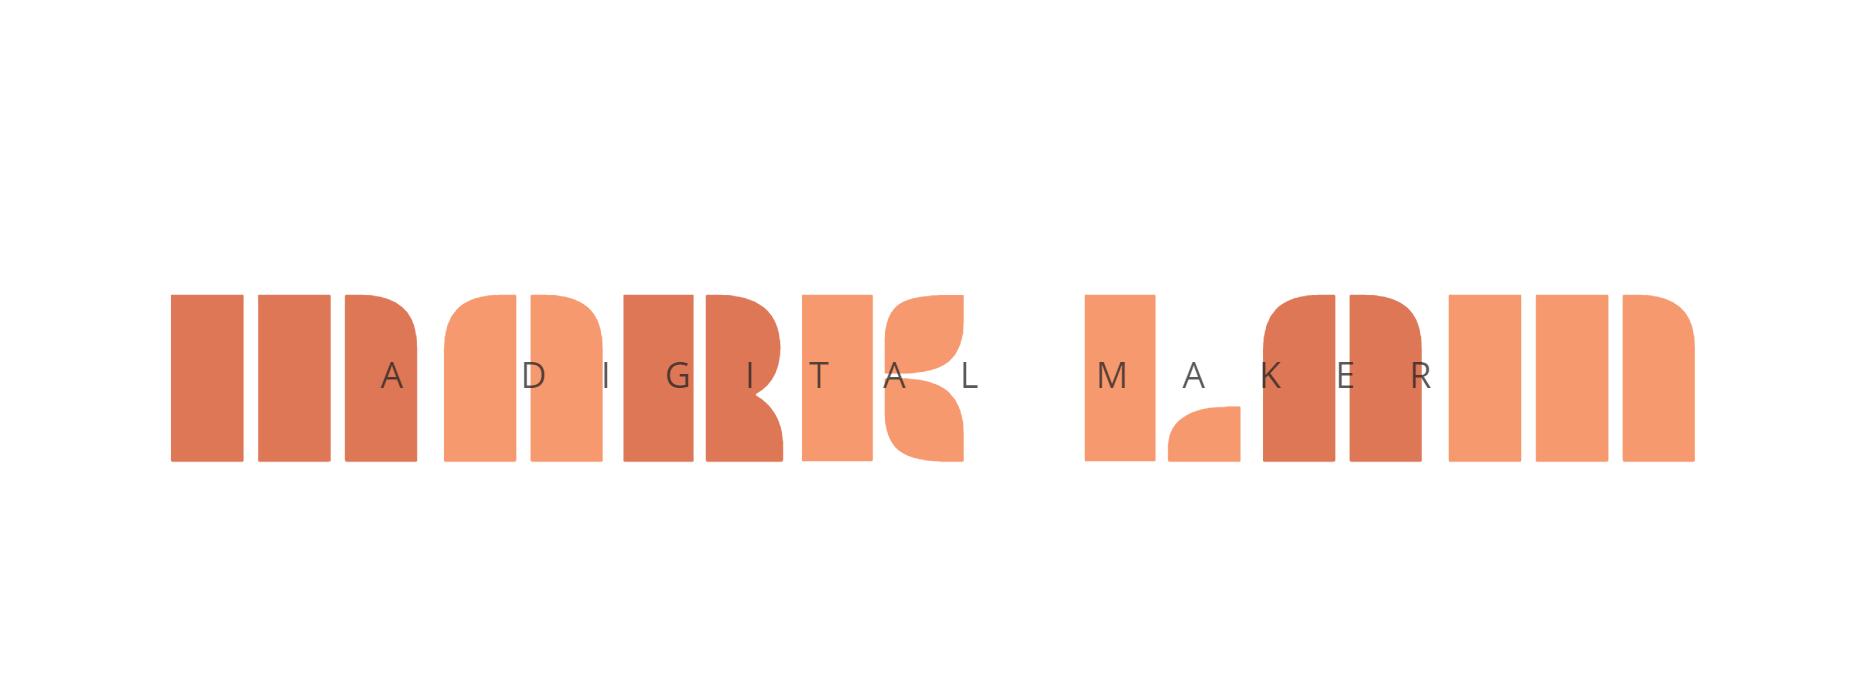 Web Typography header 1